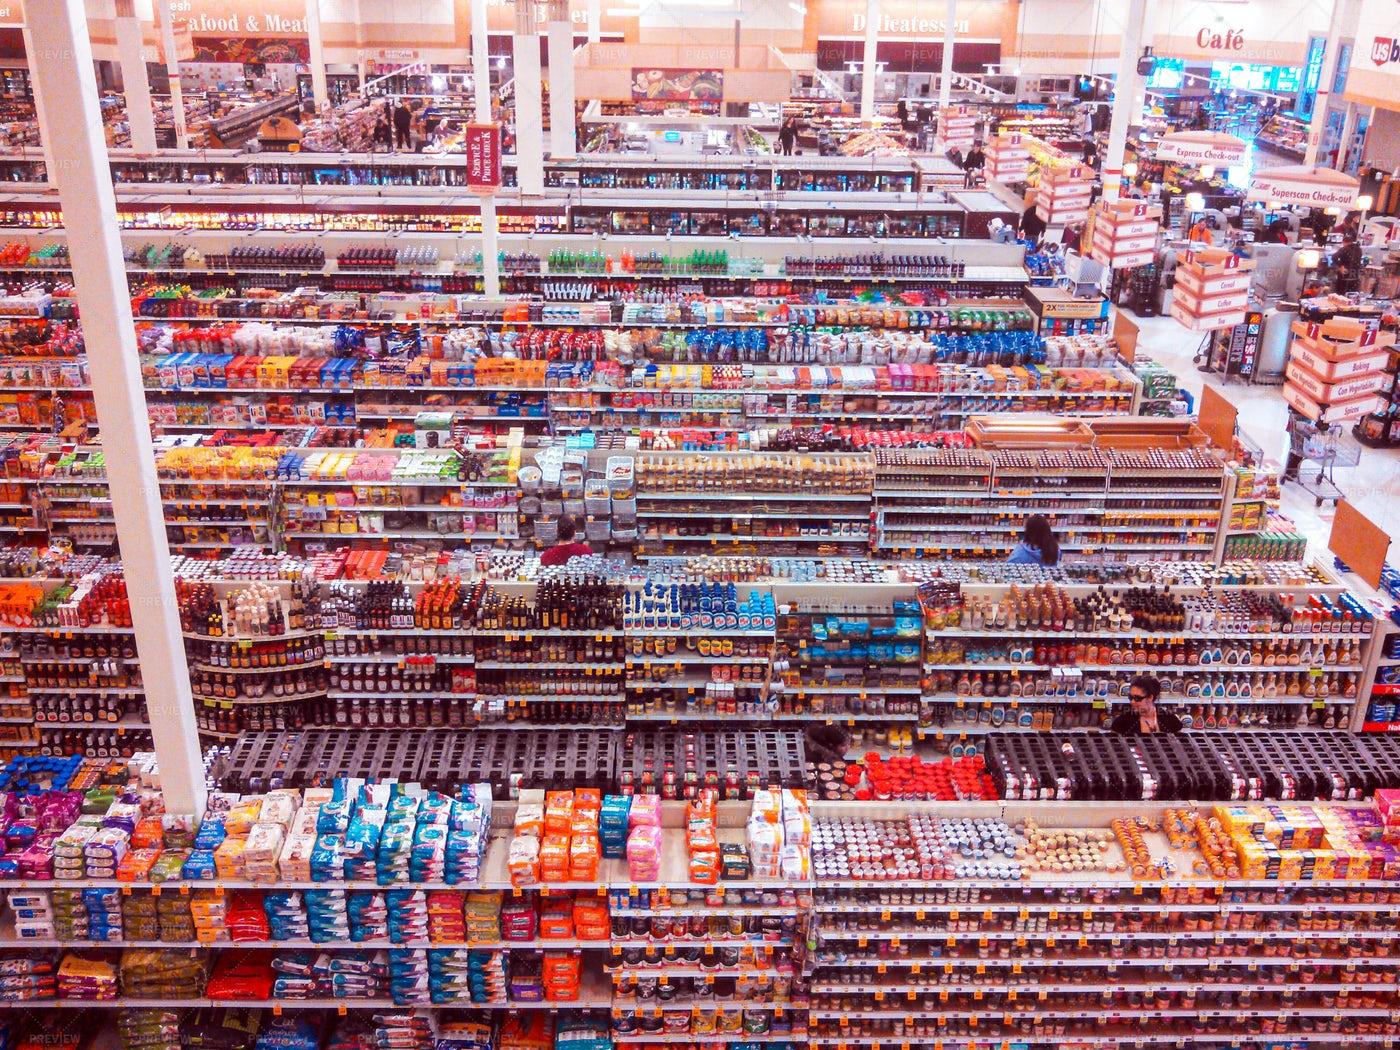 Grocery Store Interior: Stock Photos